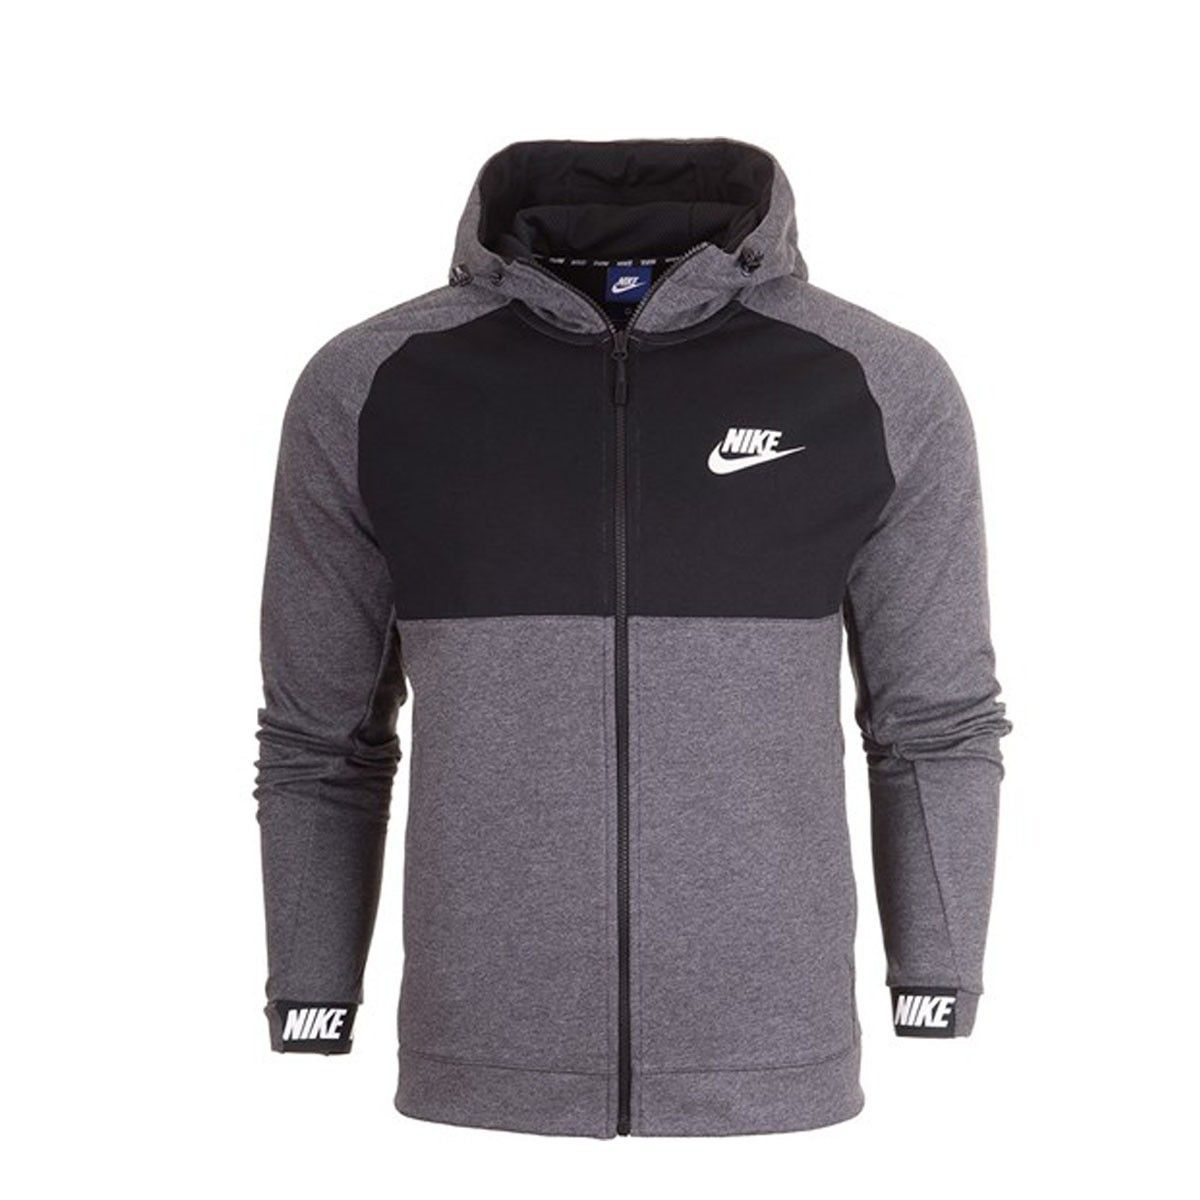 b7b7a9860608d Nike Sweat à capuche Nike Sportswear Advance 15 - 861742-071. Loading zoom